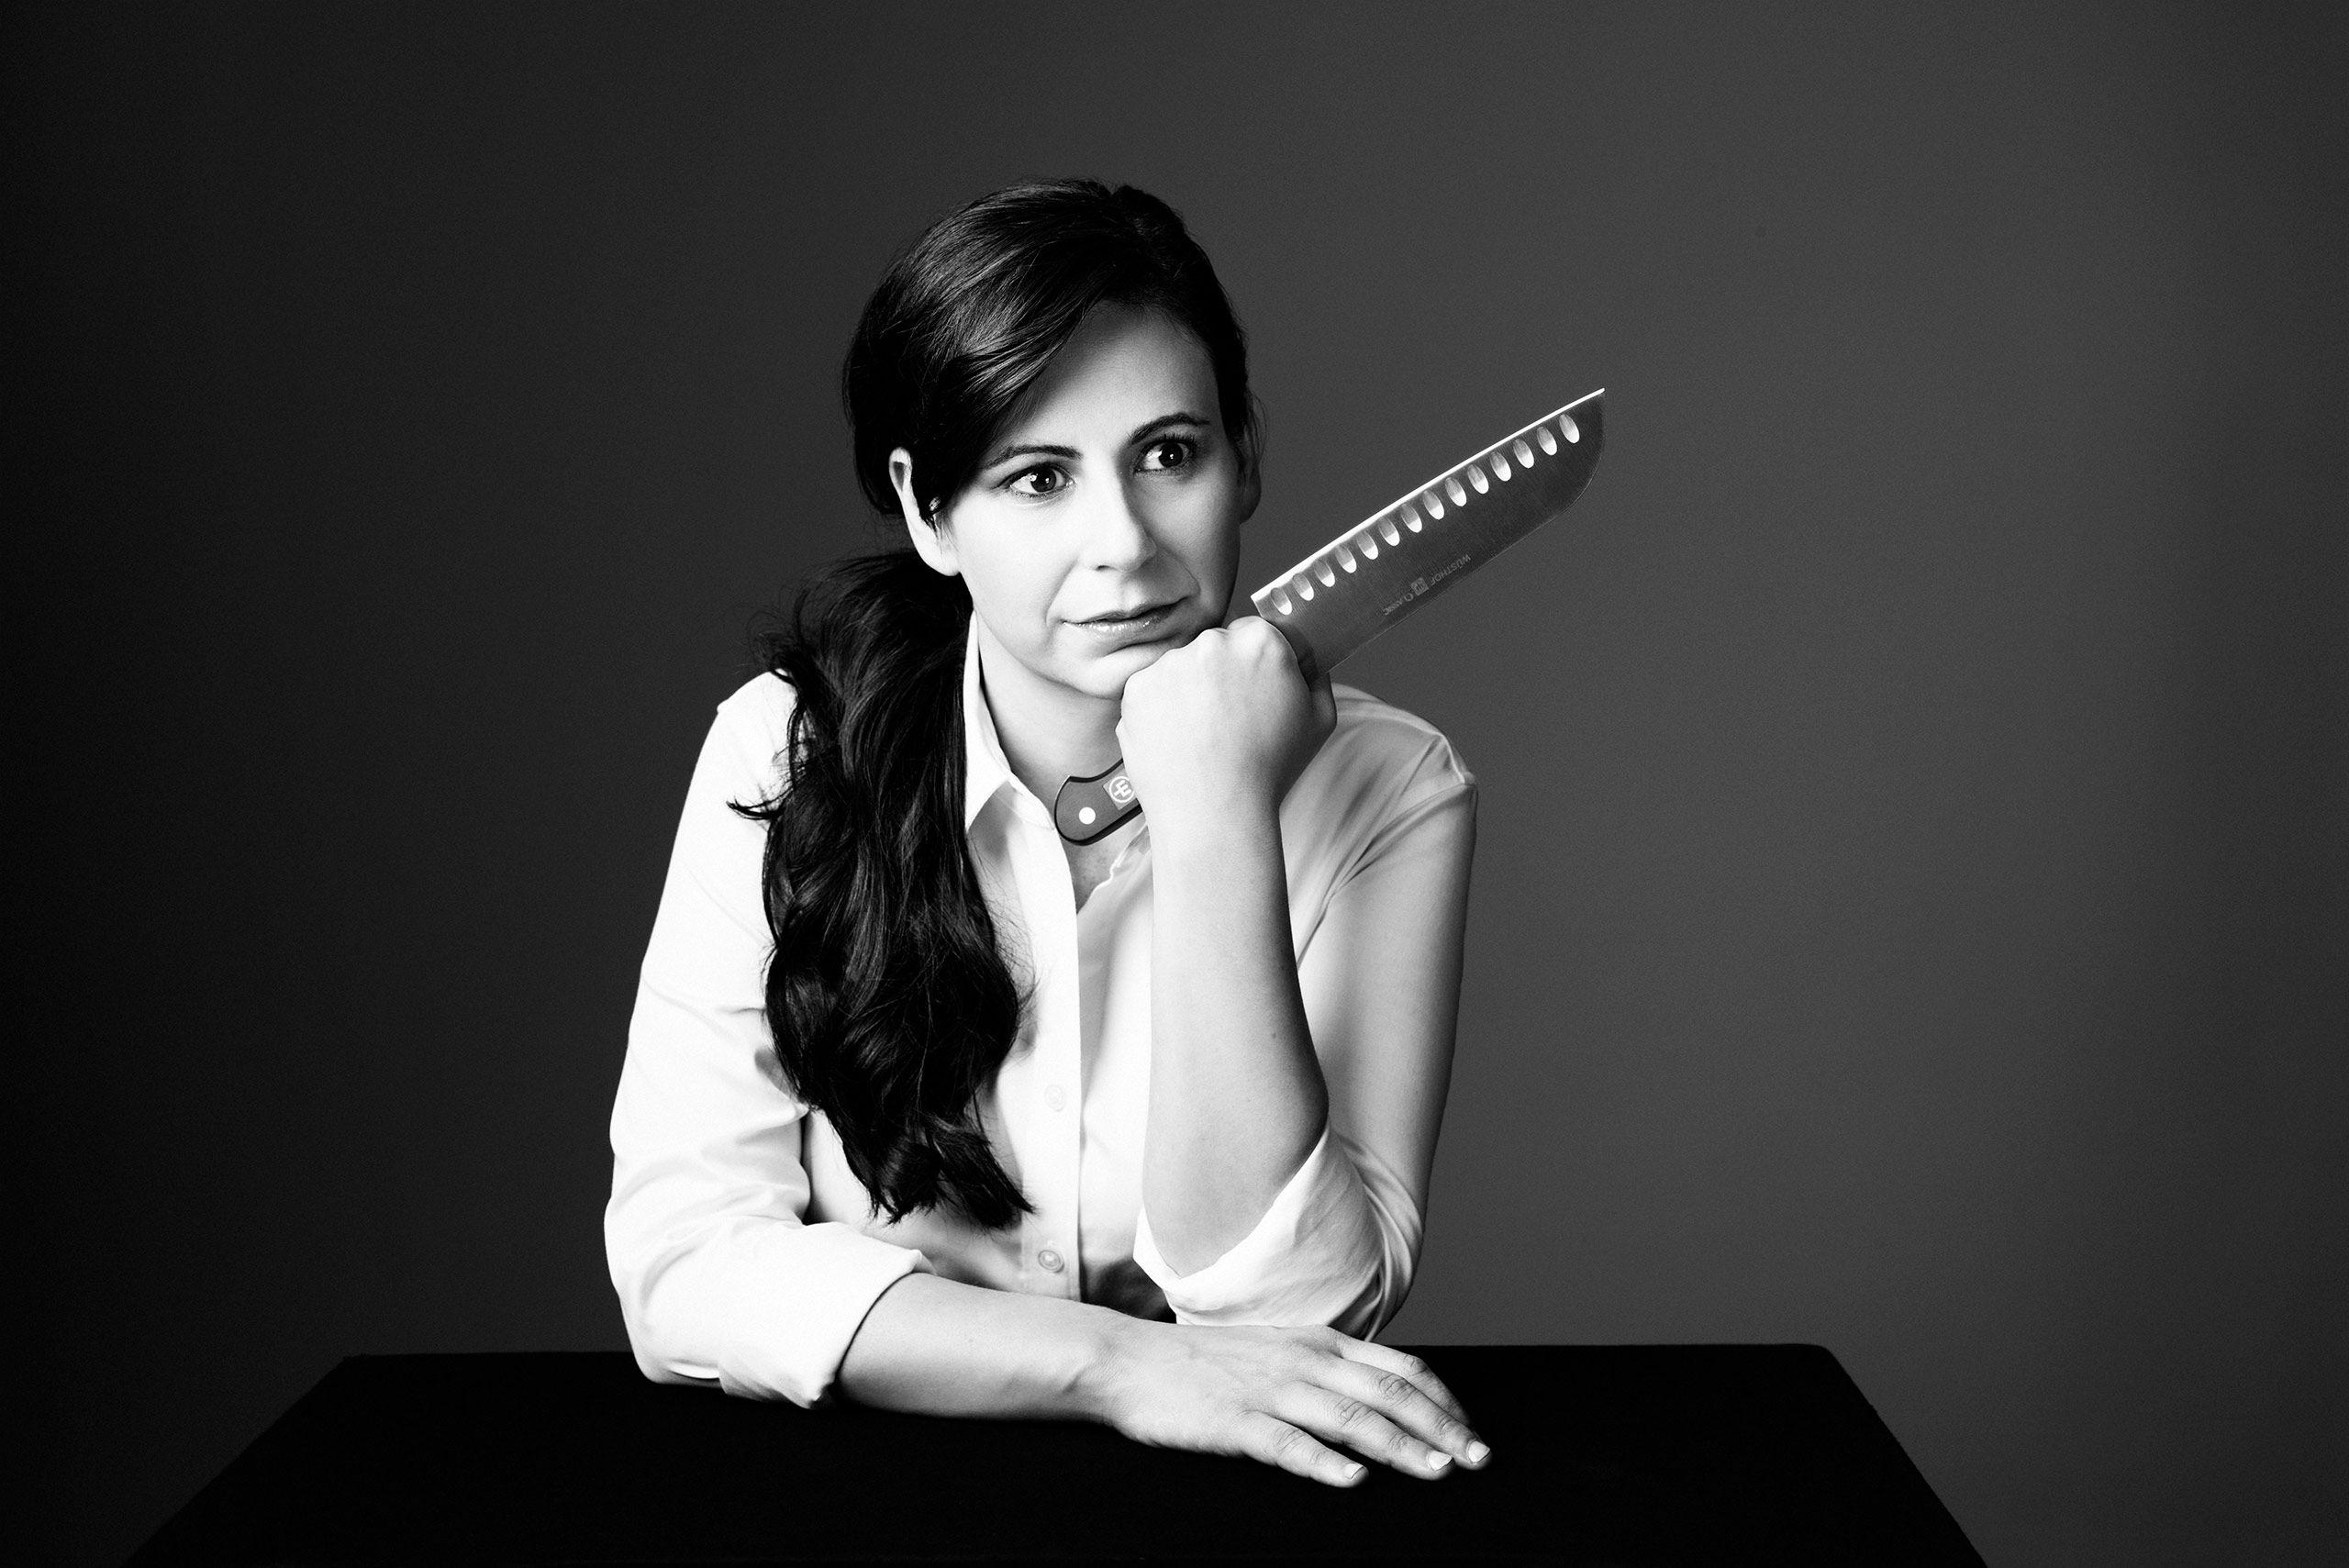 Amanda-Cohen-by-Henrik-Olund-Photography.jpg